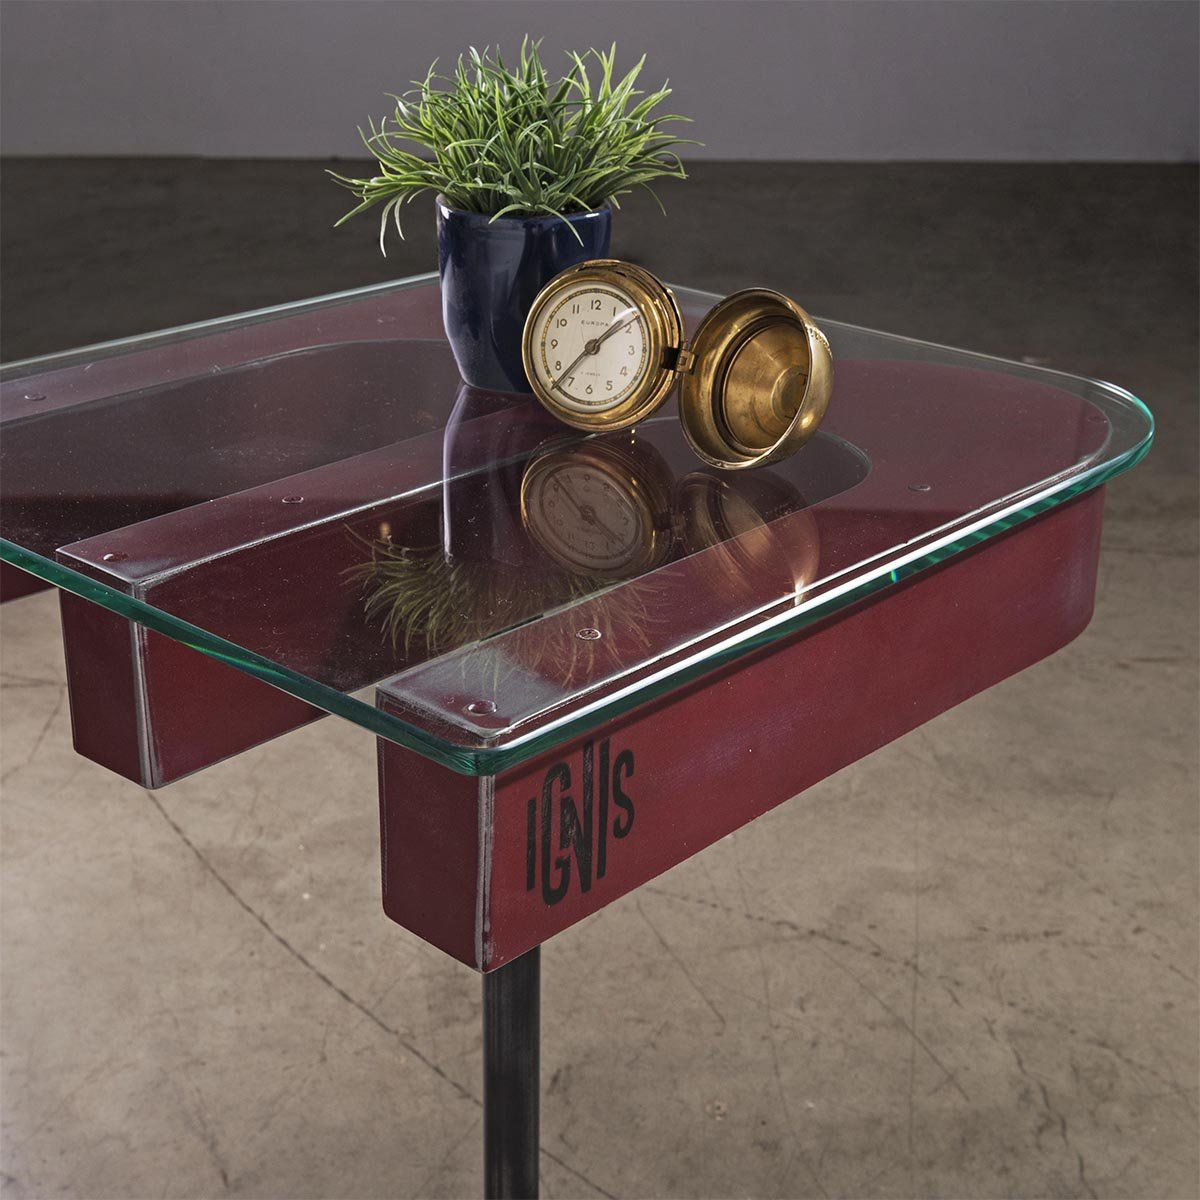 M Table Ignis Industrial Mesa Lateral Estilo Upcycle Produzida